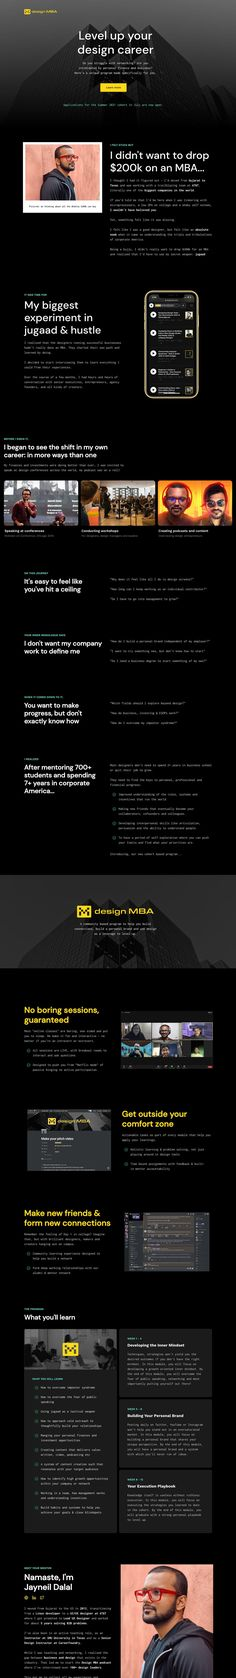 Slick dark-schemed Landing Page (built using Webflow) announcing the first design MBA cohort with Jayneil Dalal.